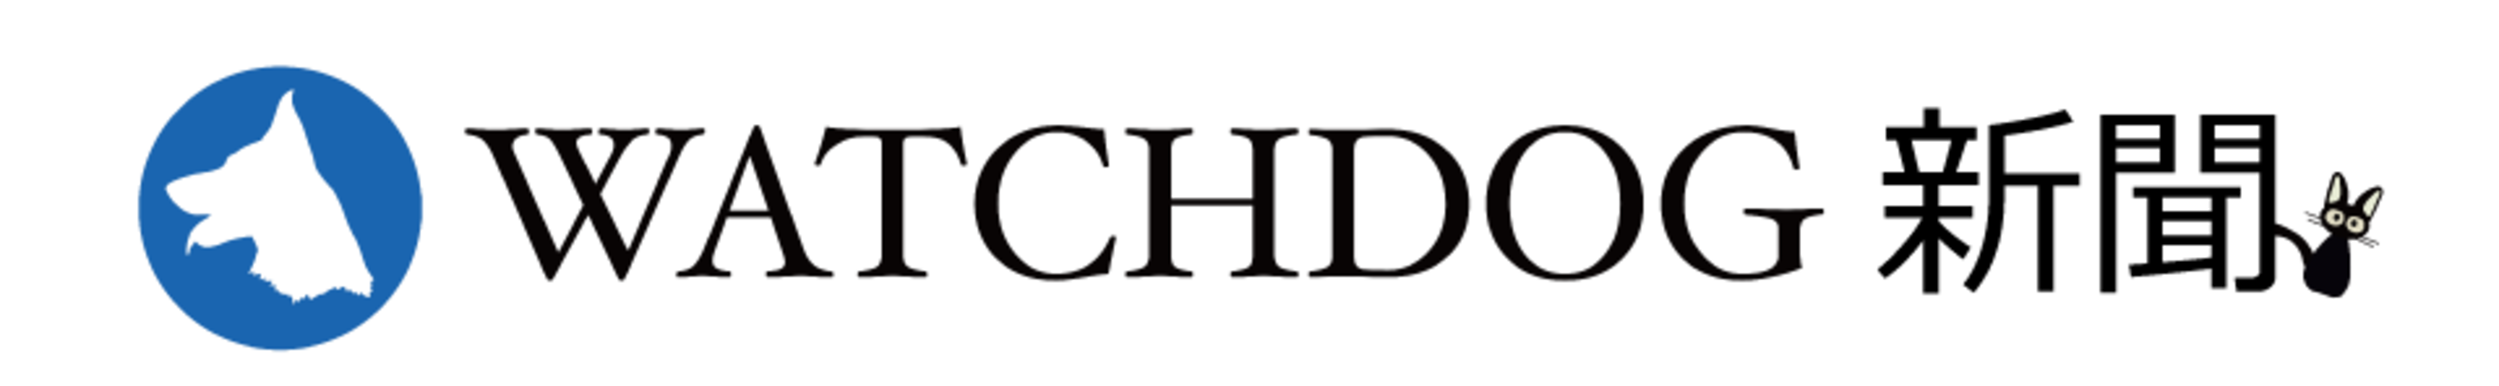 WATCHDOG新聞